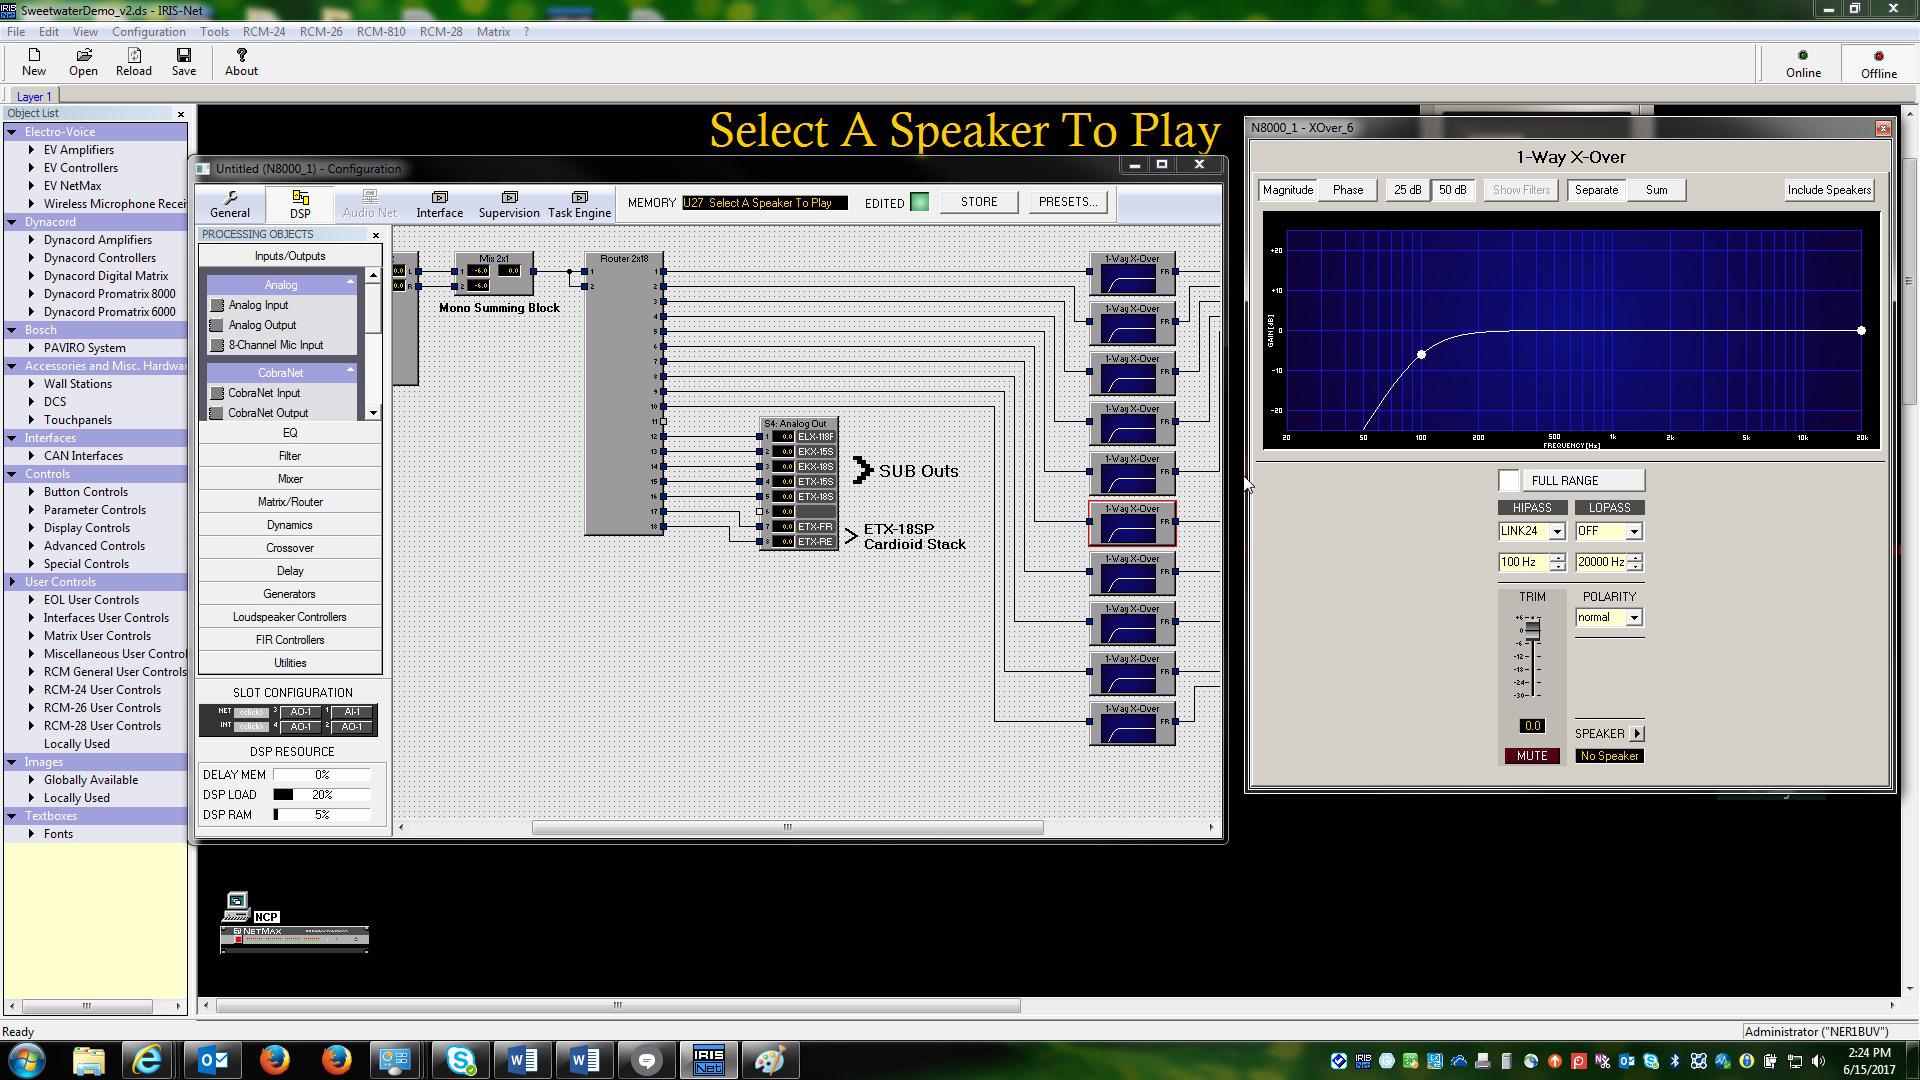 IRIS‑Net Integrated software platform for remote